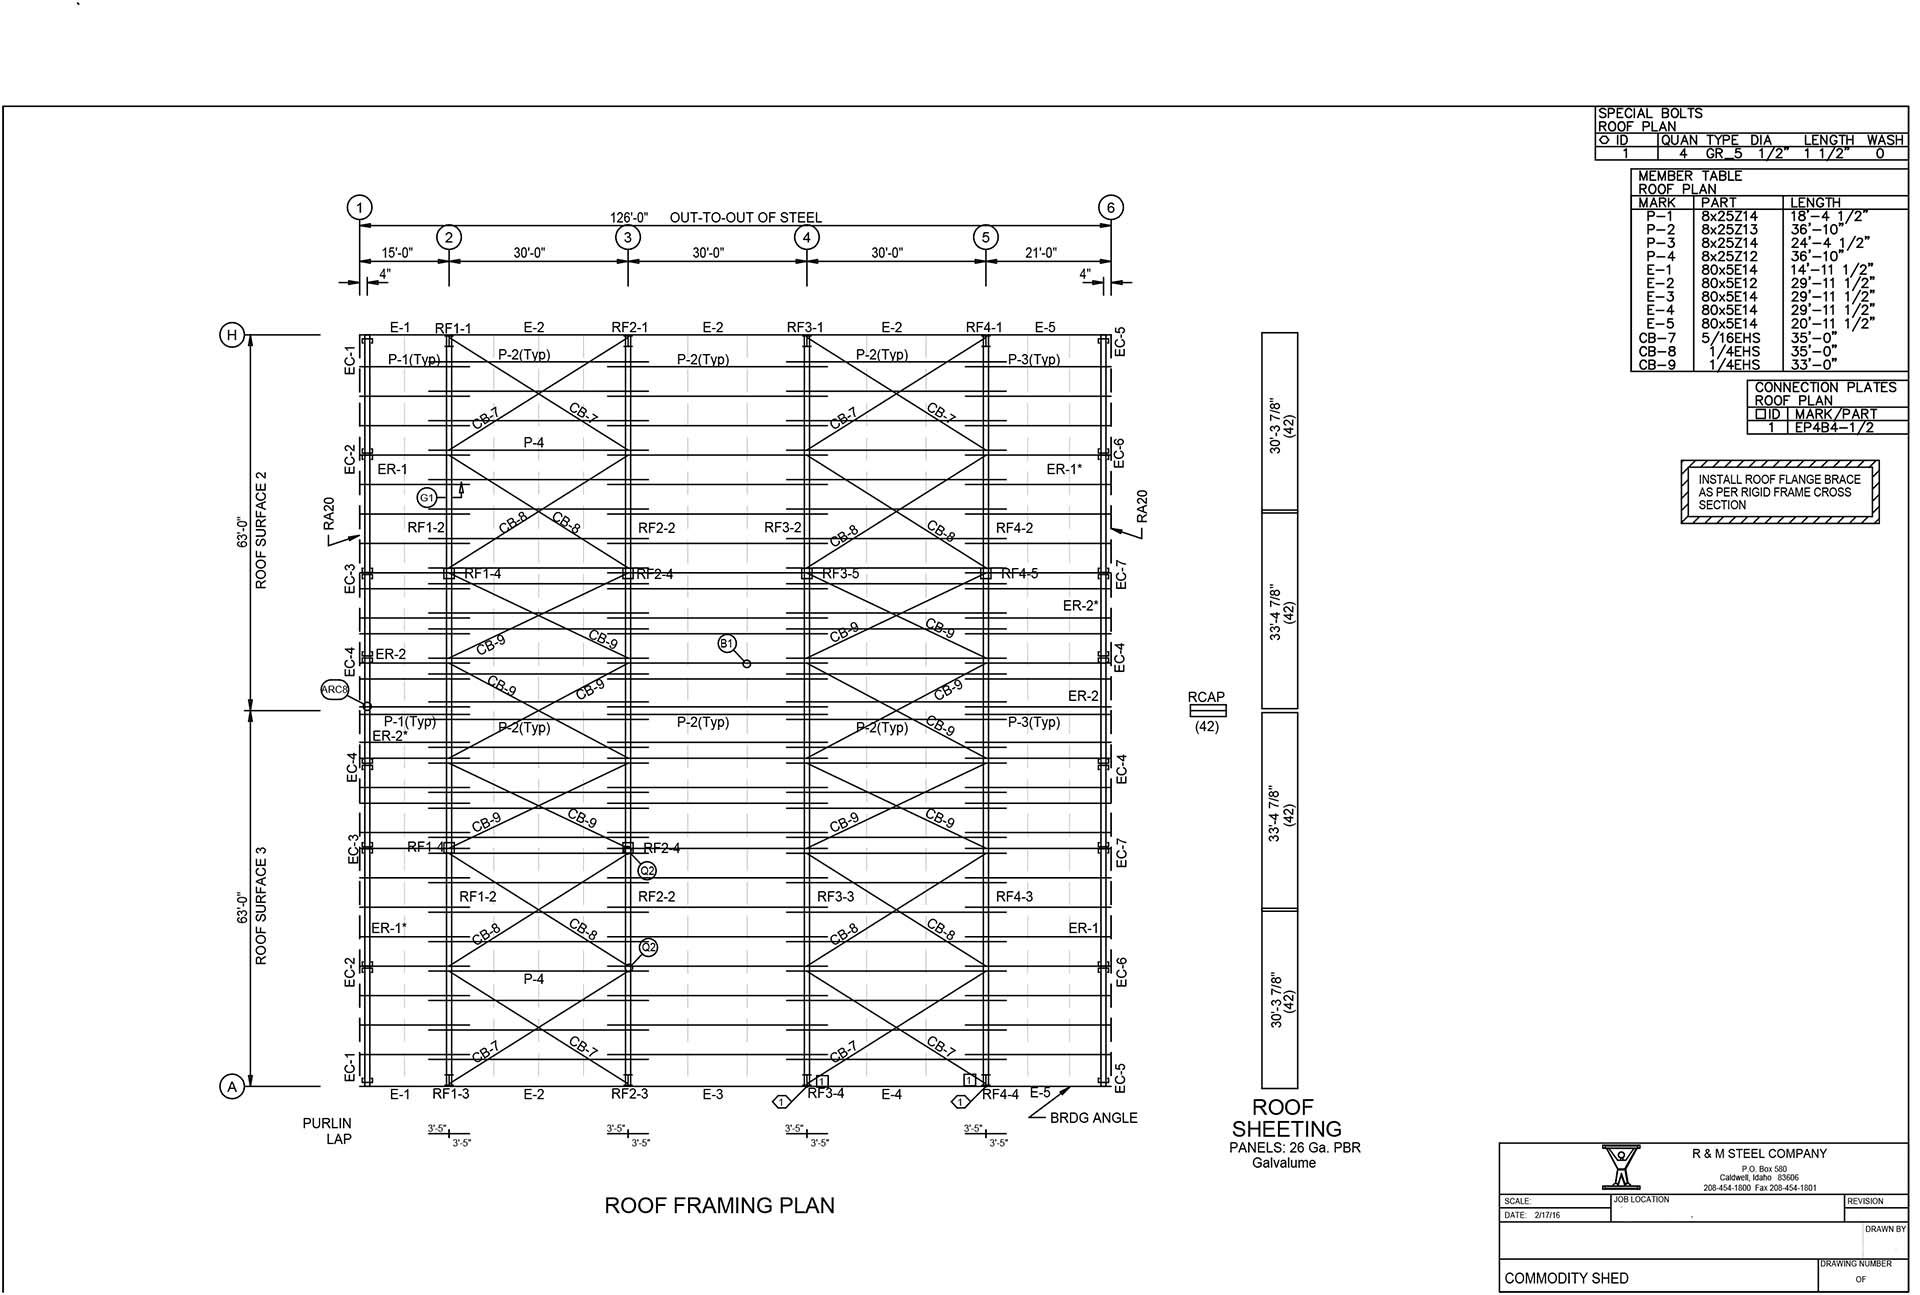 \\steel2017a\Drawings\DRAWINGS\2016\02\FA126126\14-Roof.FC7